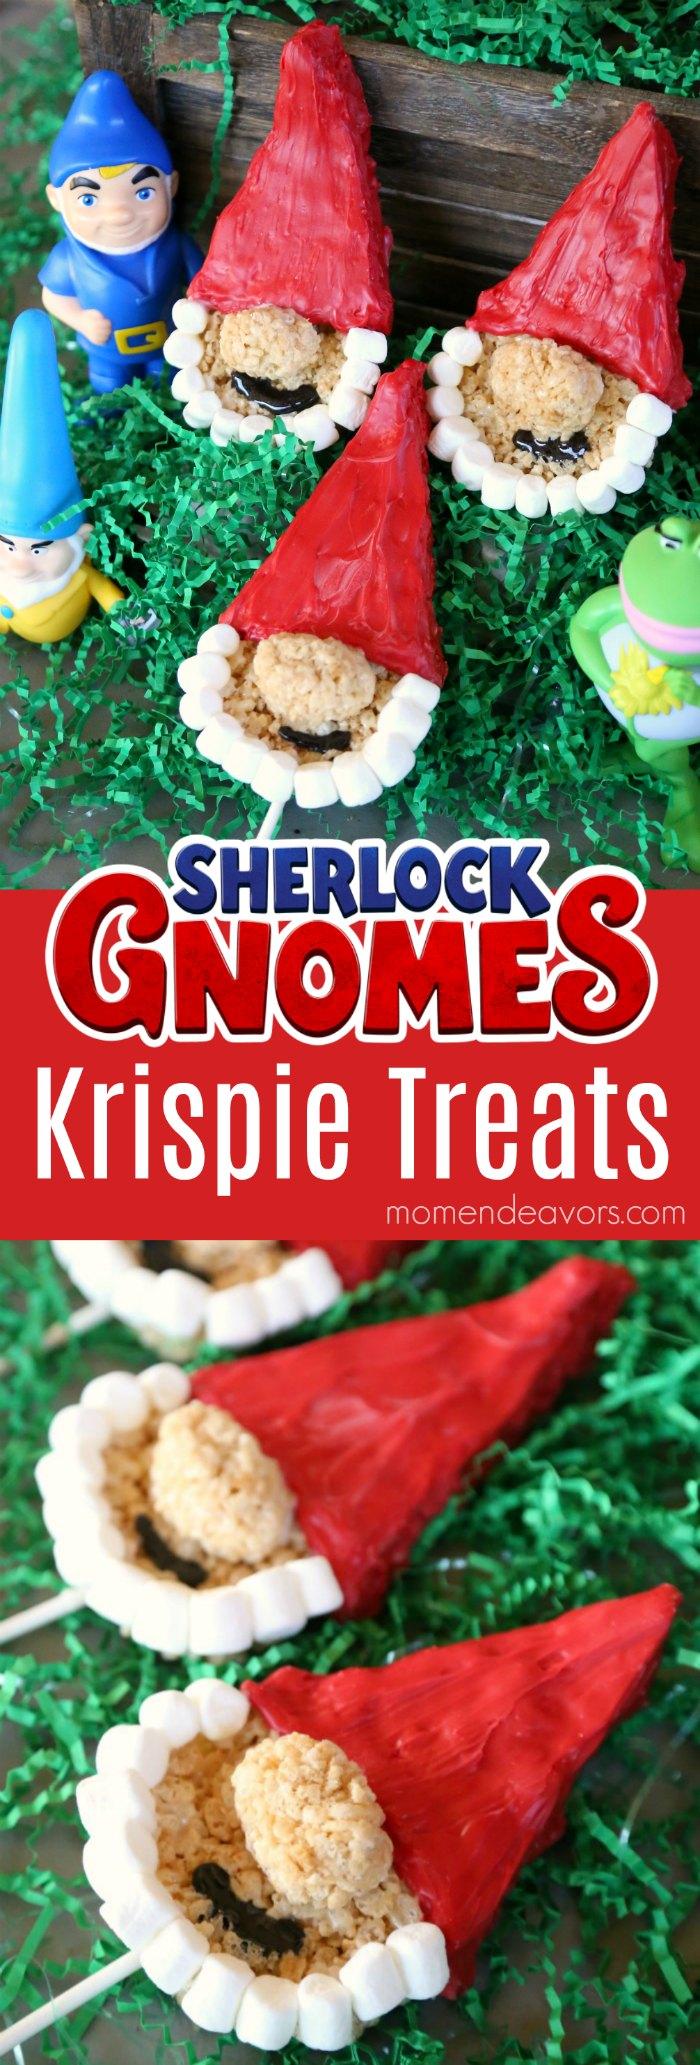 Sherlock Gnomes Recipe